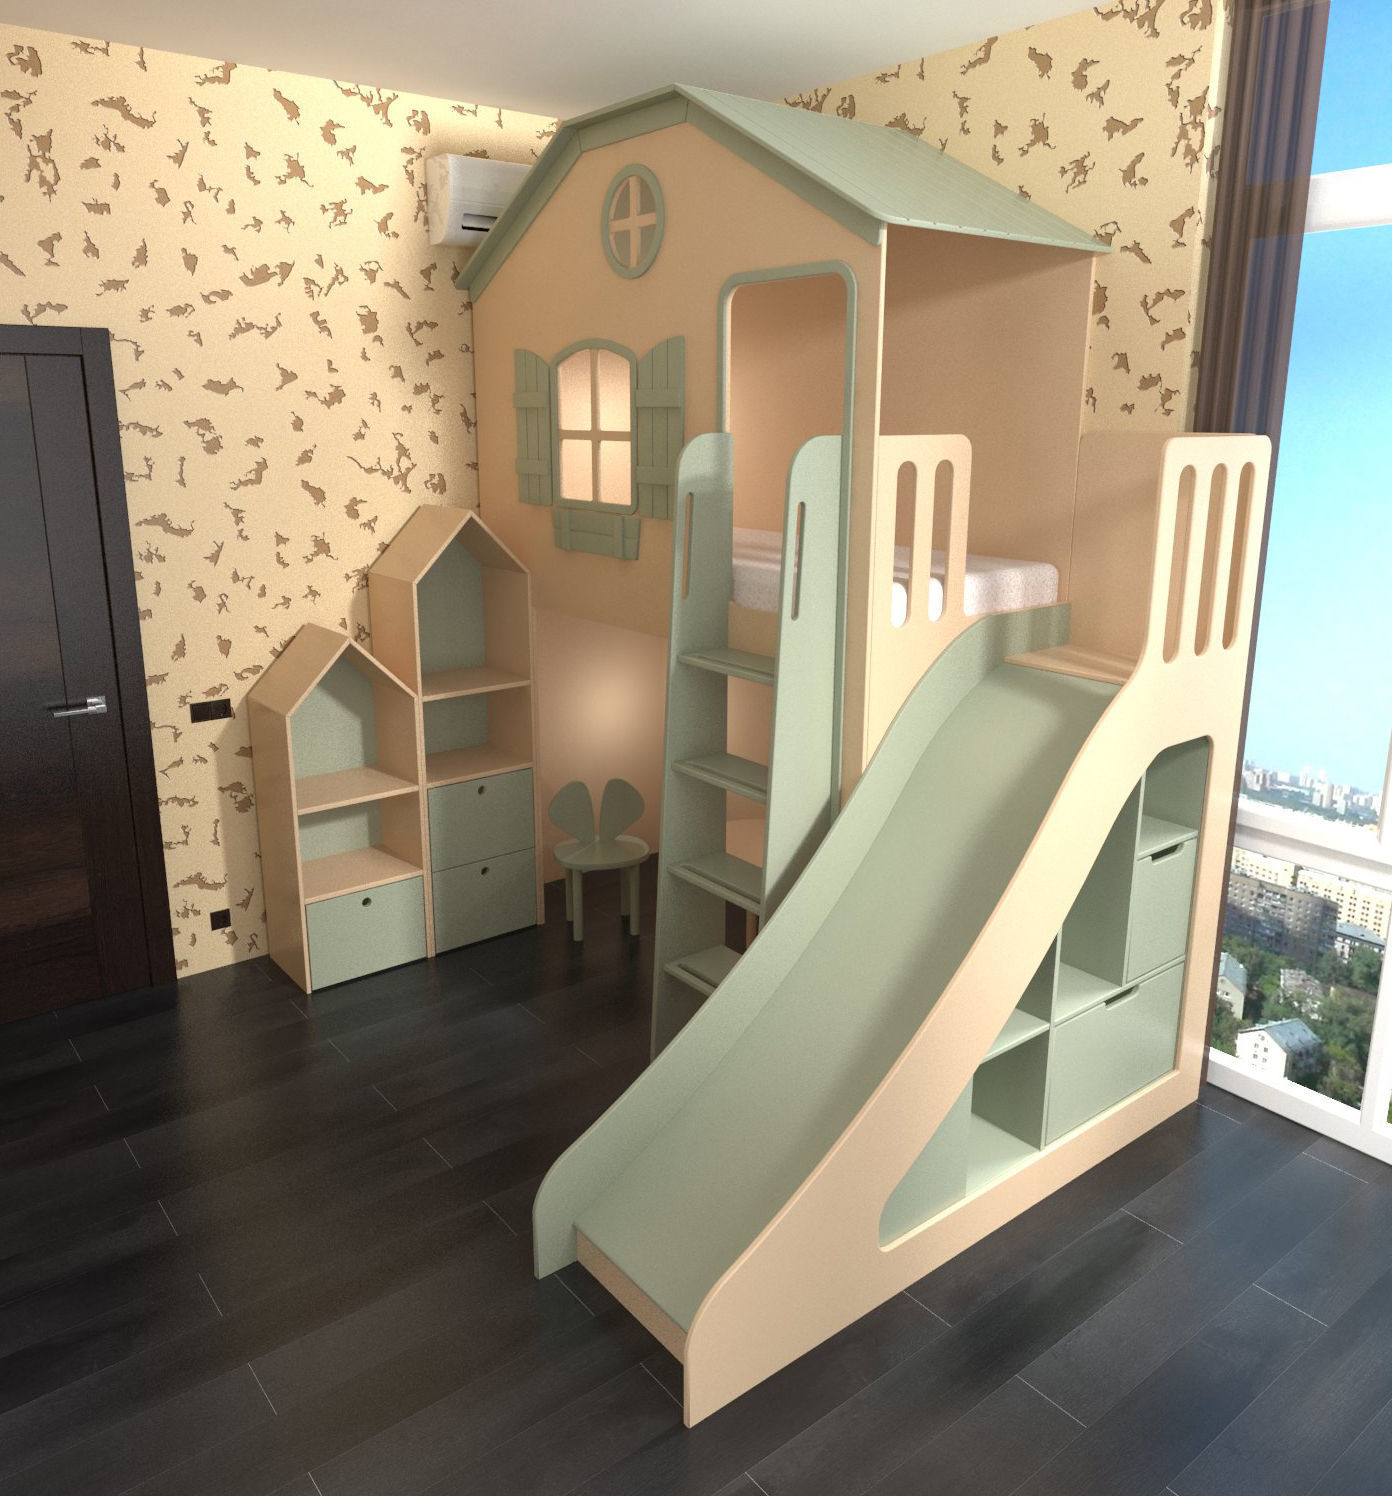 Playground with slide